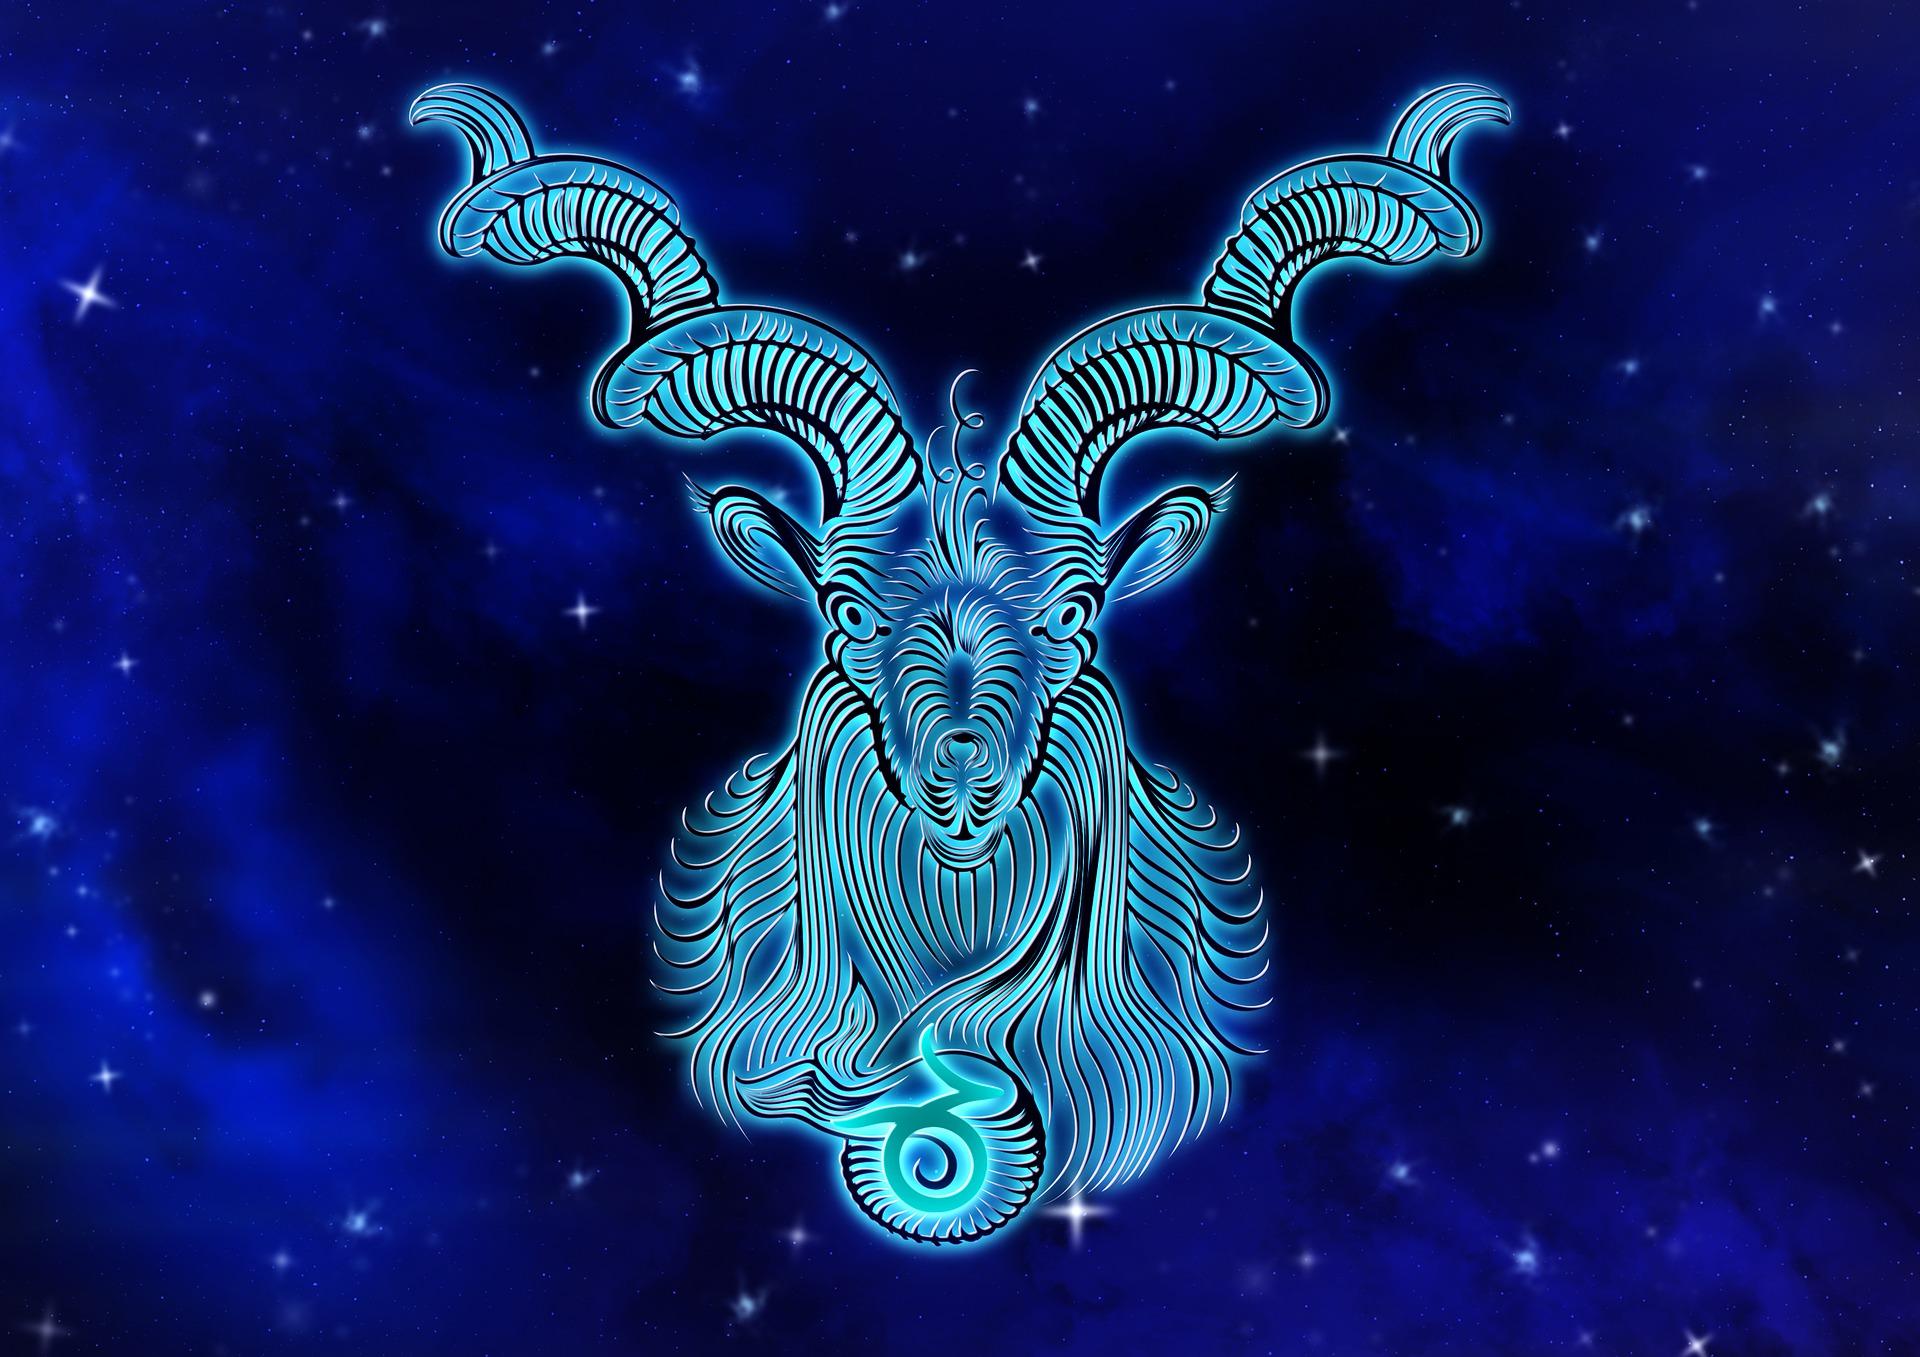 Jarac godišnji horoskop 2020